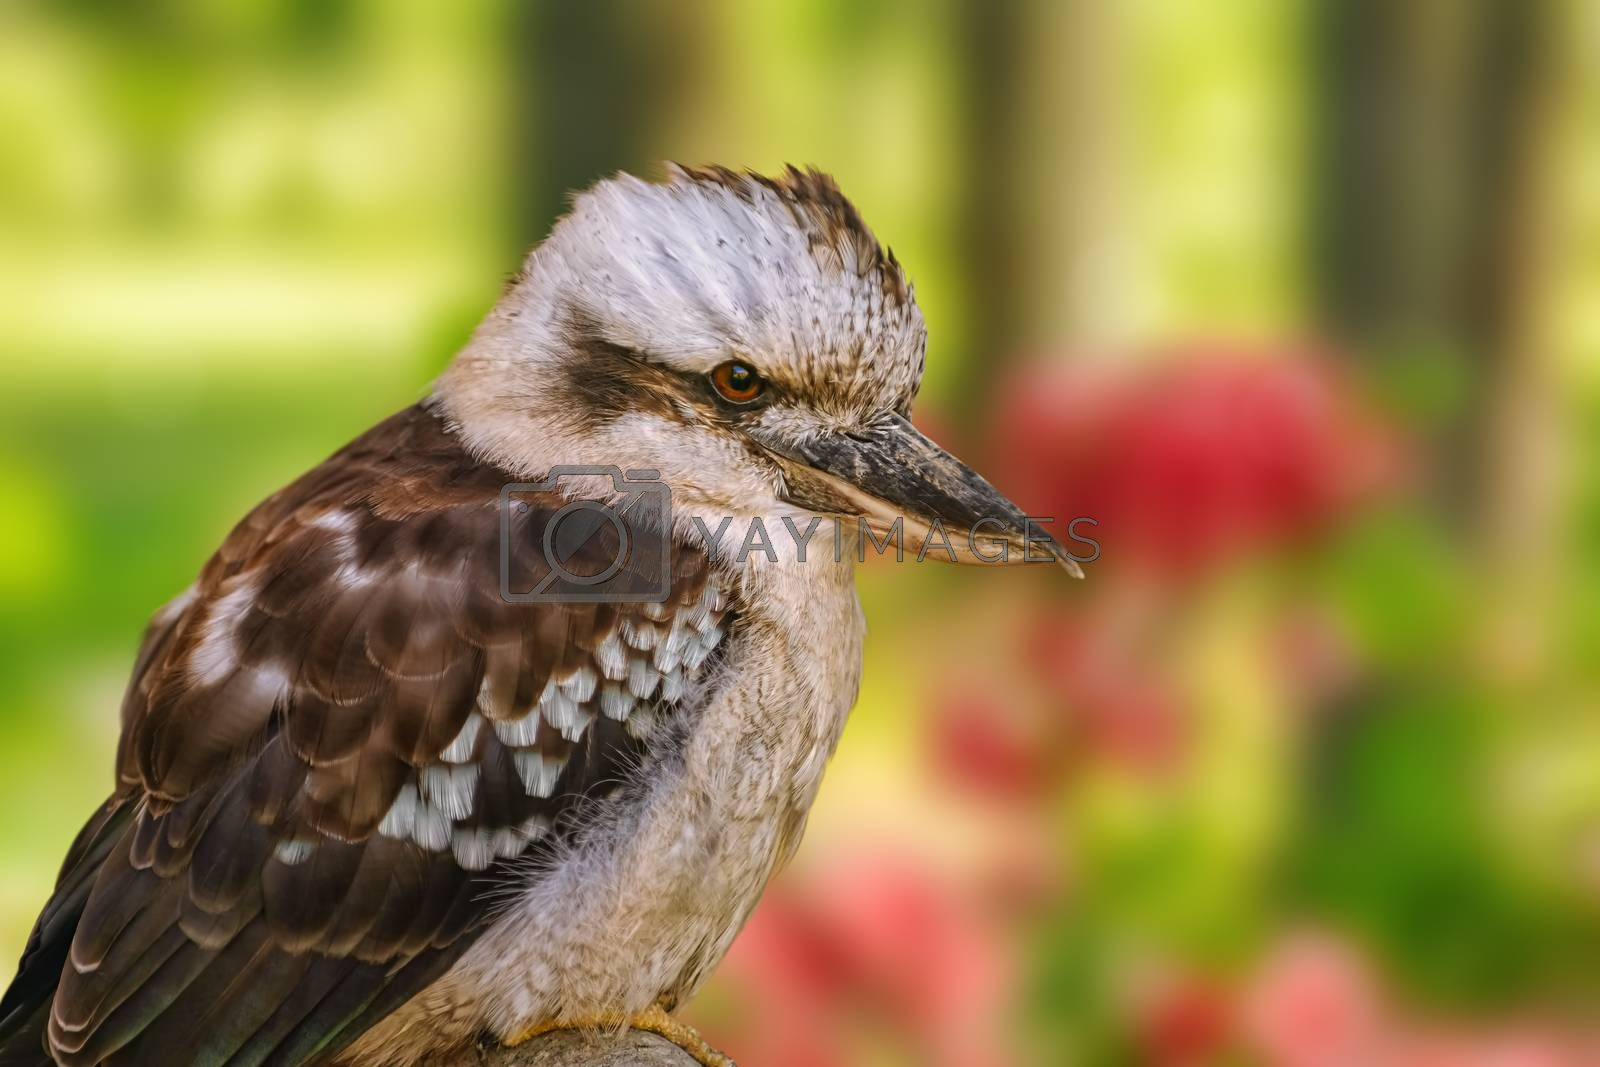 Kookaburras, terrestrial tree kingfishers by SNR